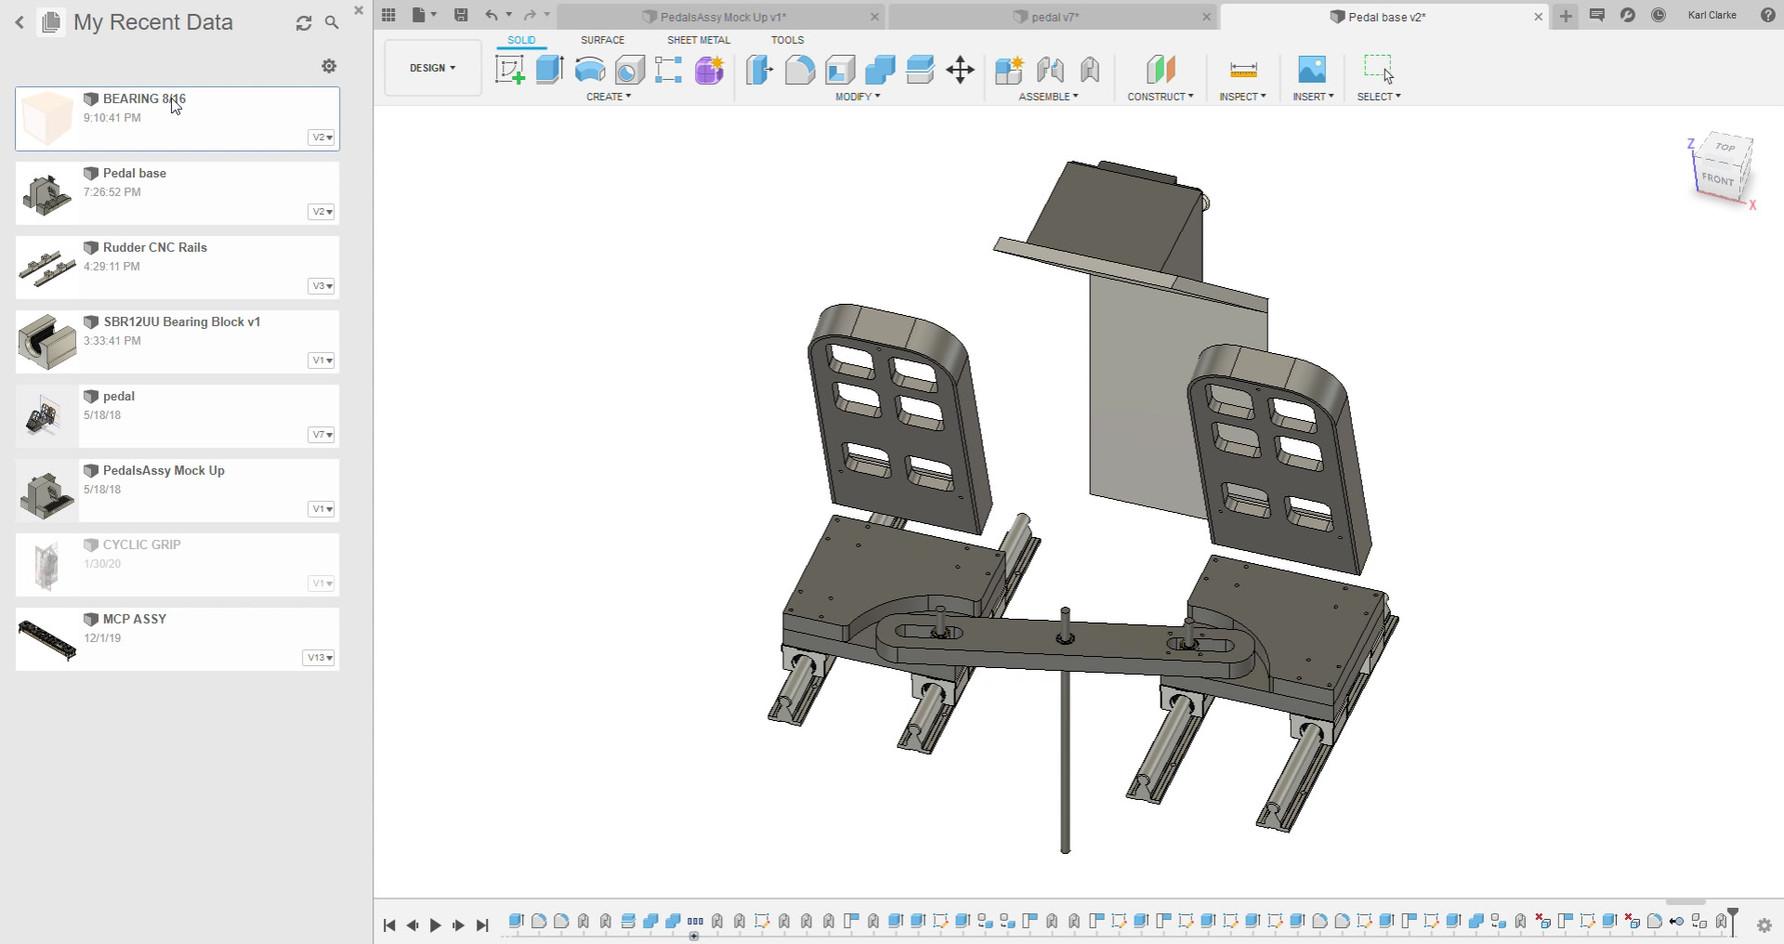 Autodesk Fusion 360 2020-02-21 22-33-37.